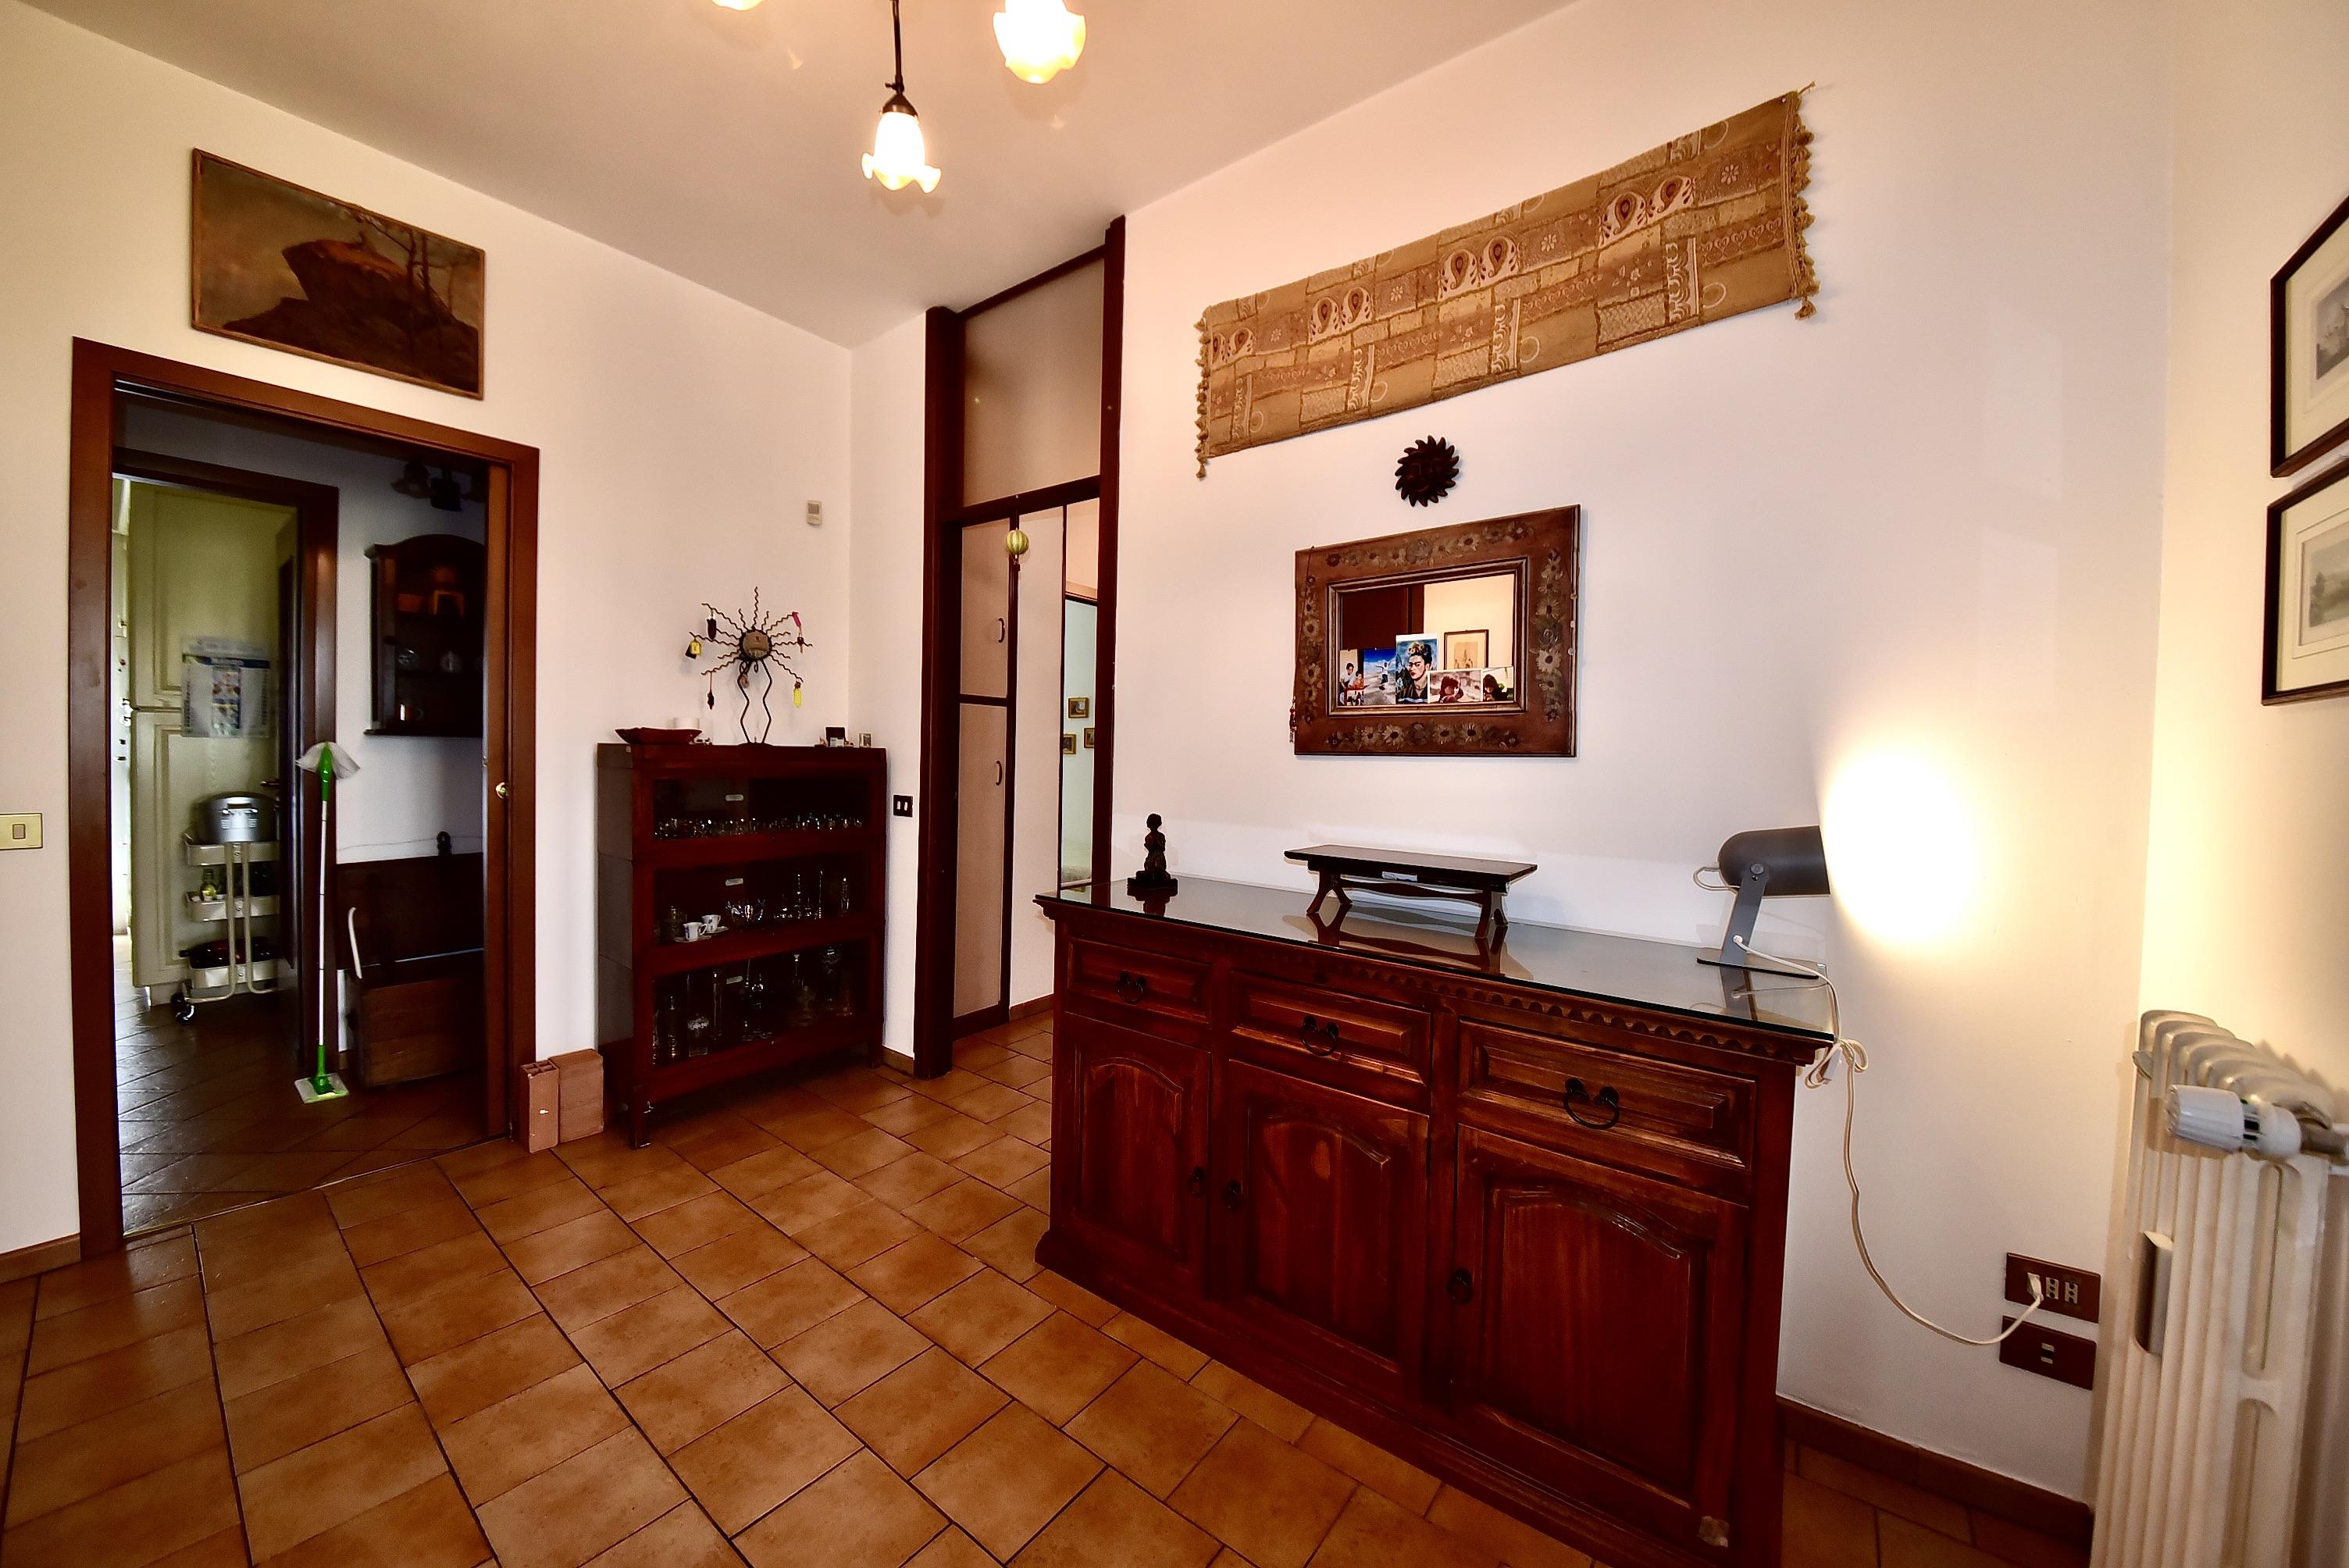 190 mq. San Gimignano ad.ze